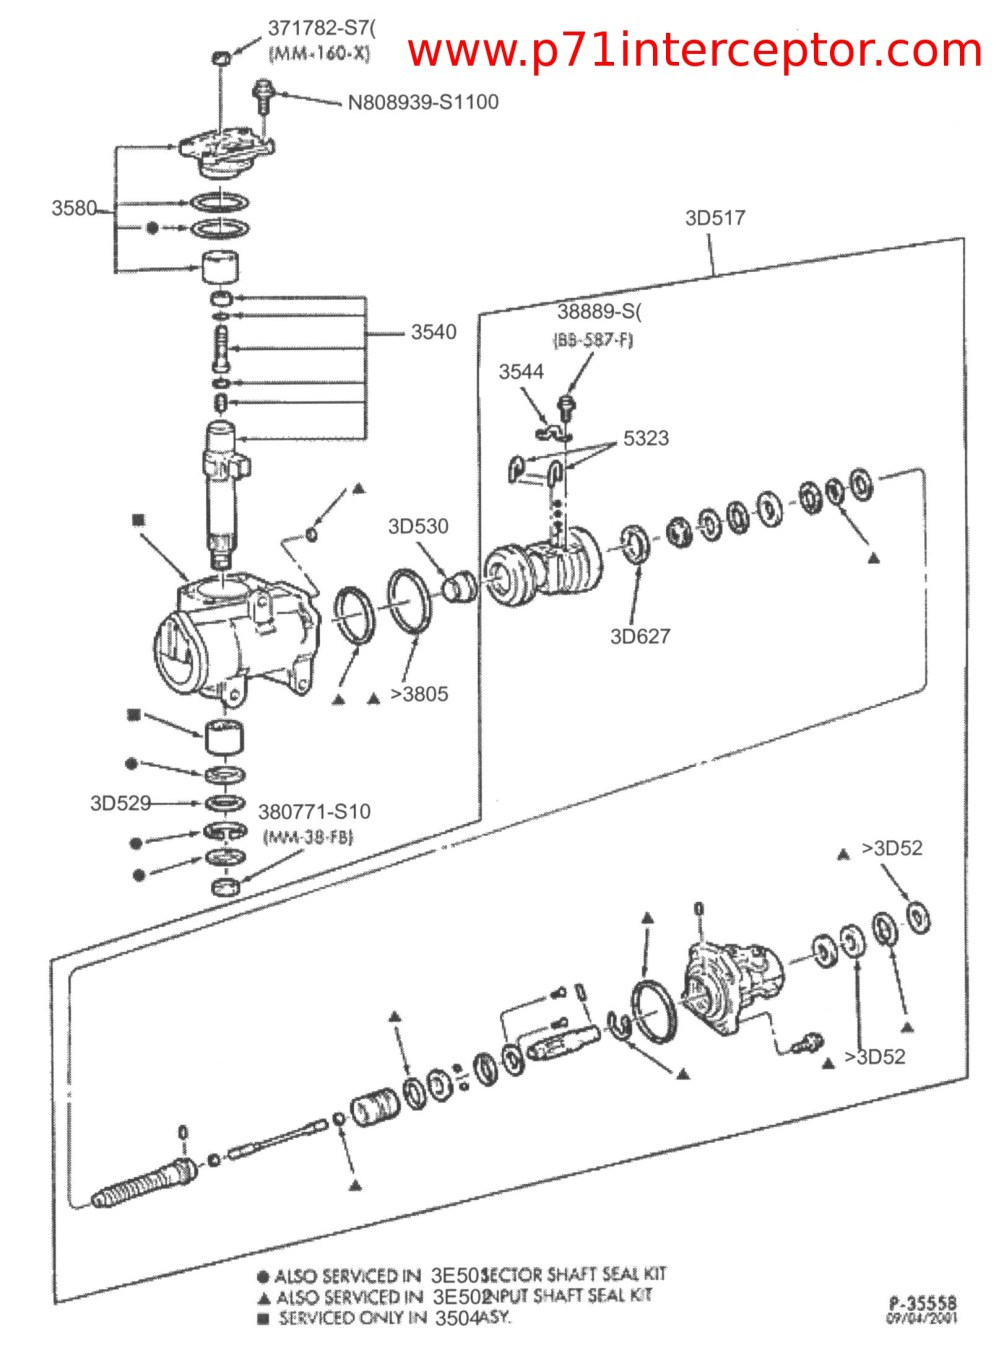 medium resolution of crown victoria steering linkage p71interceptor com 1995 ford steering column diagram http wwwsteeringcolumnservices